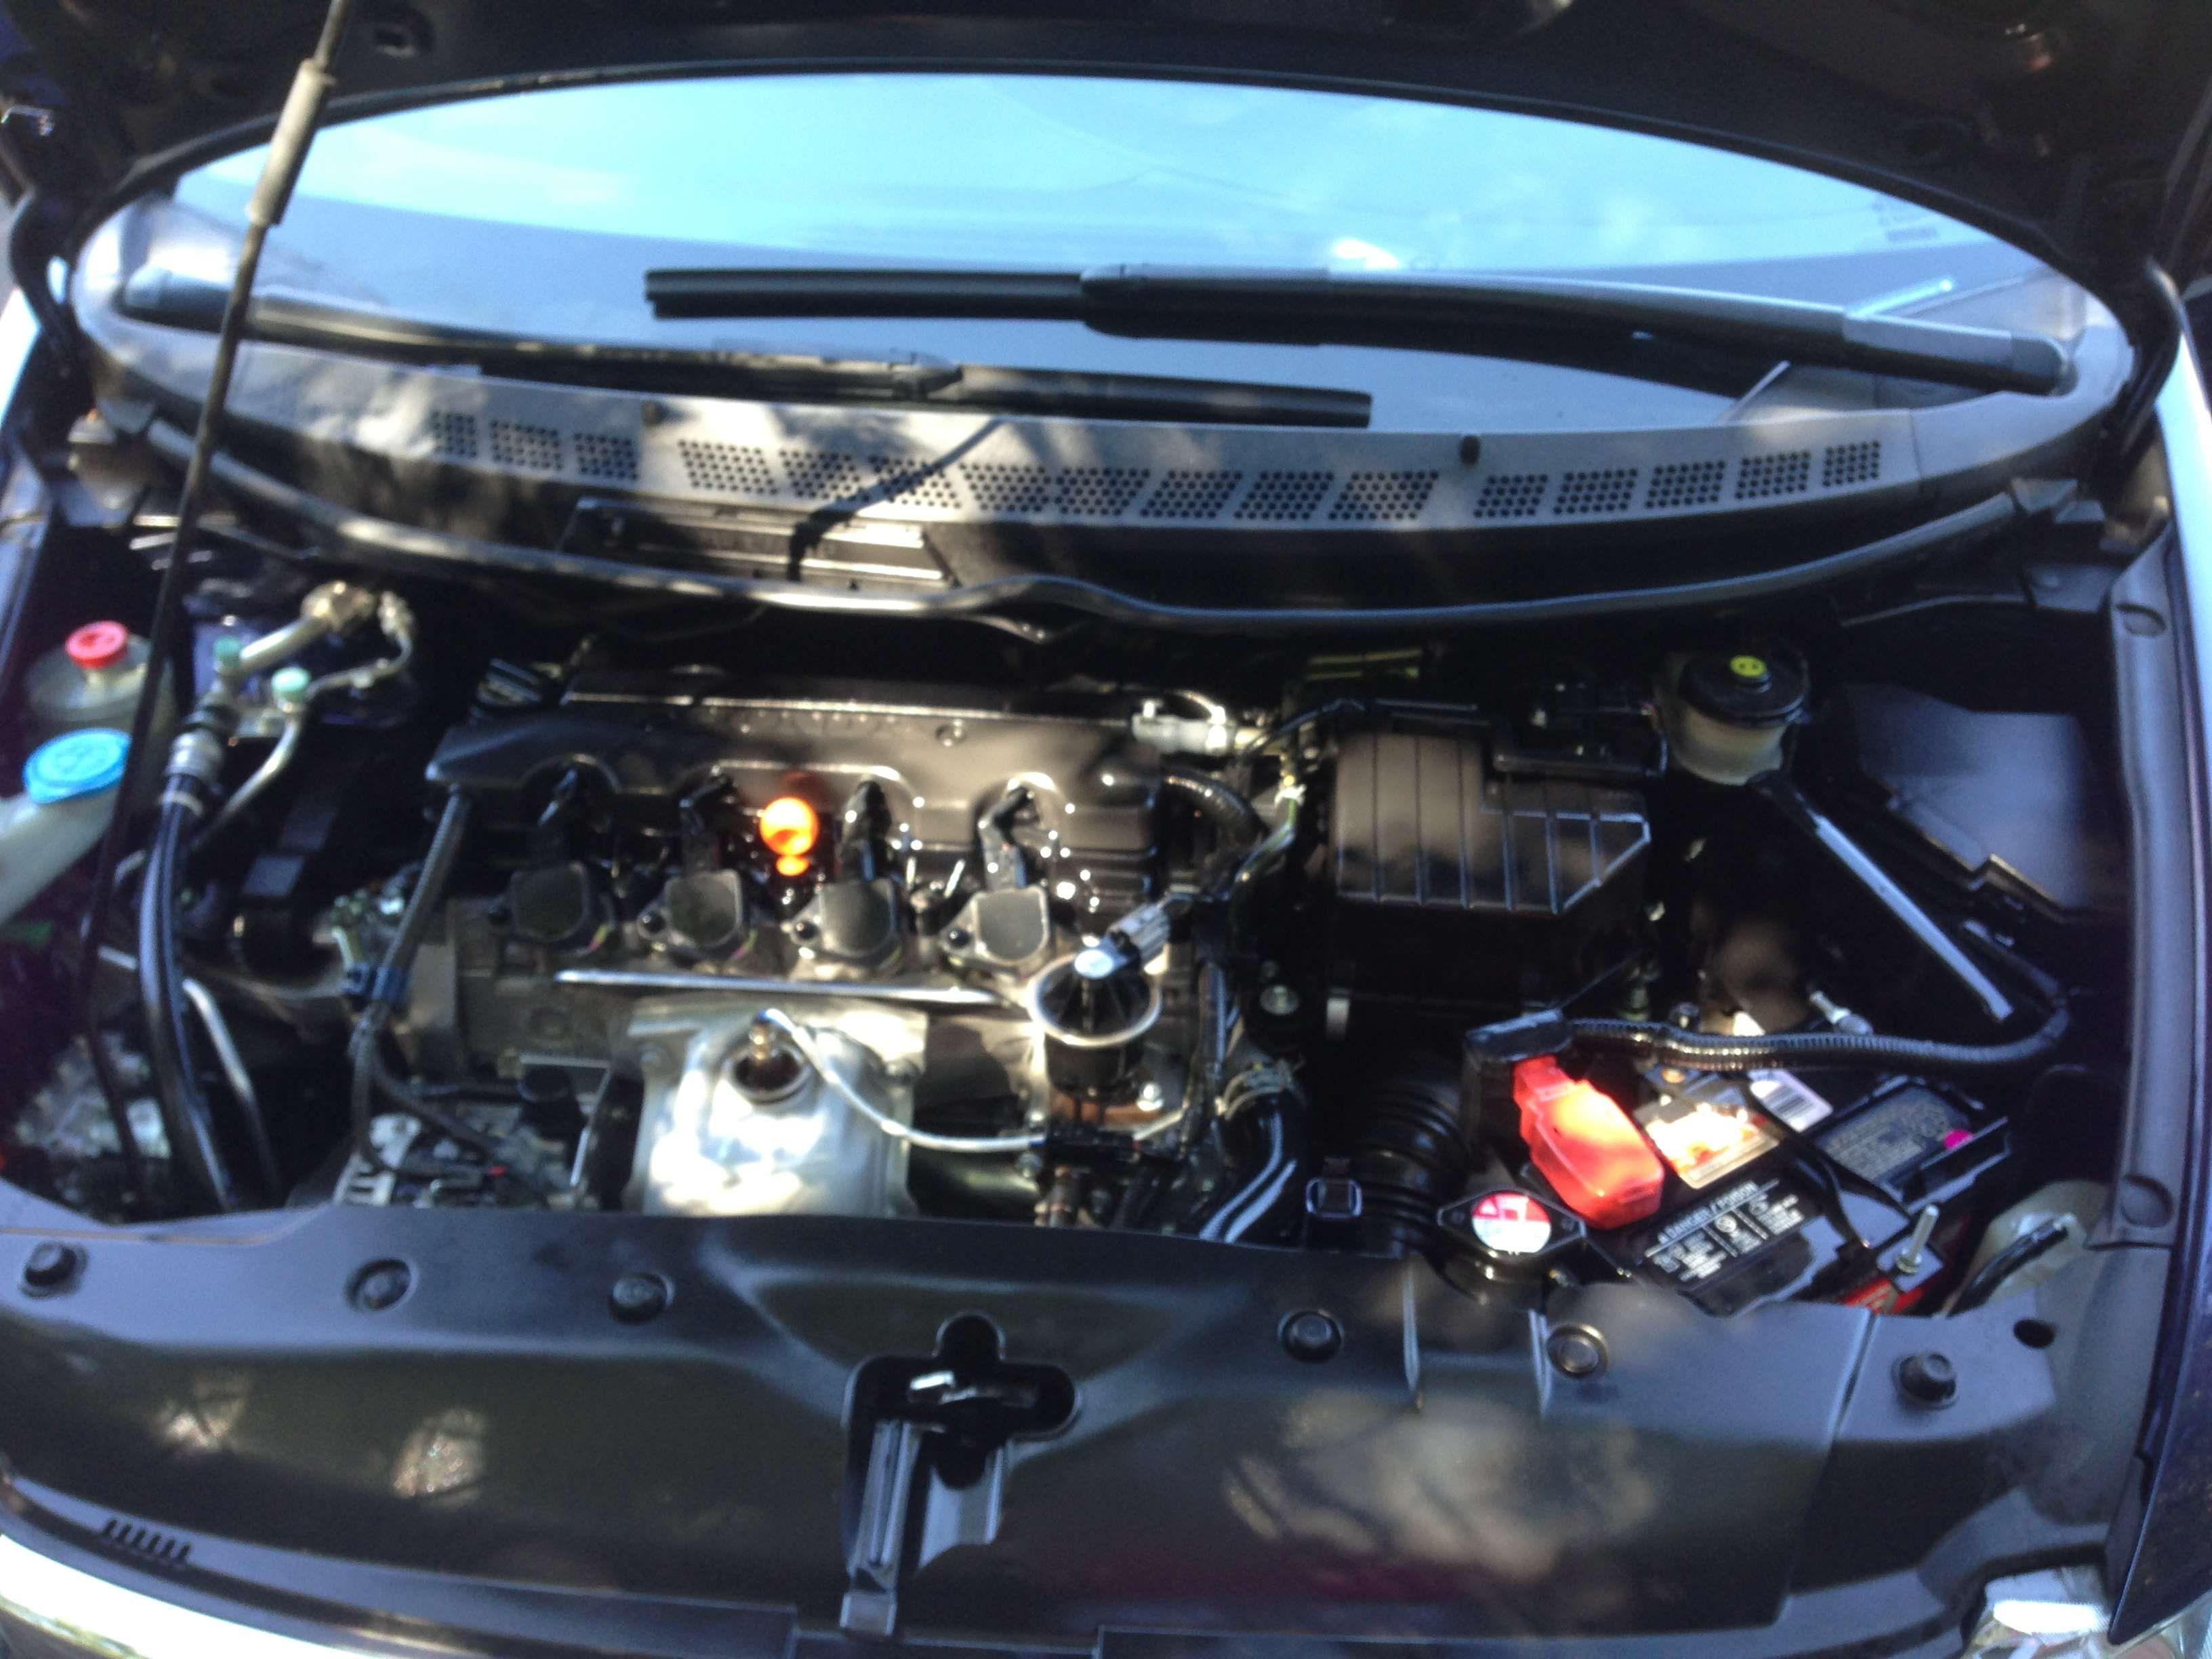 Make Honda Model Civic Year 2007 Body Style Sedan Exterior Color